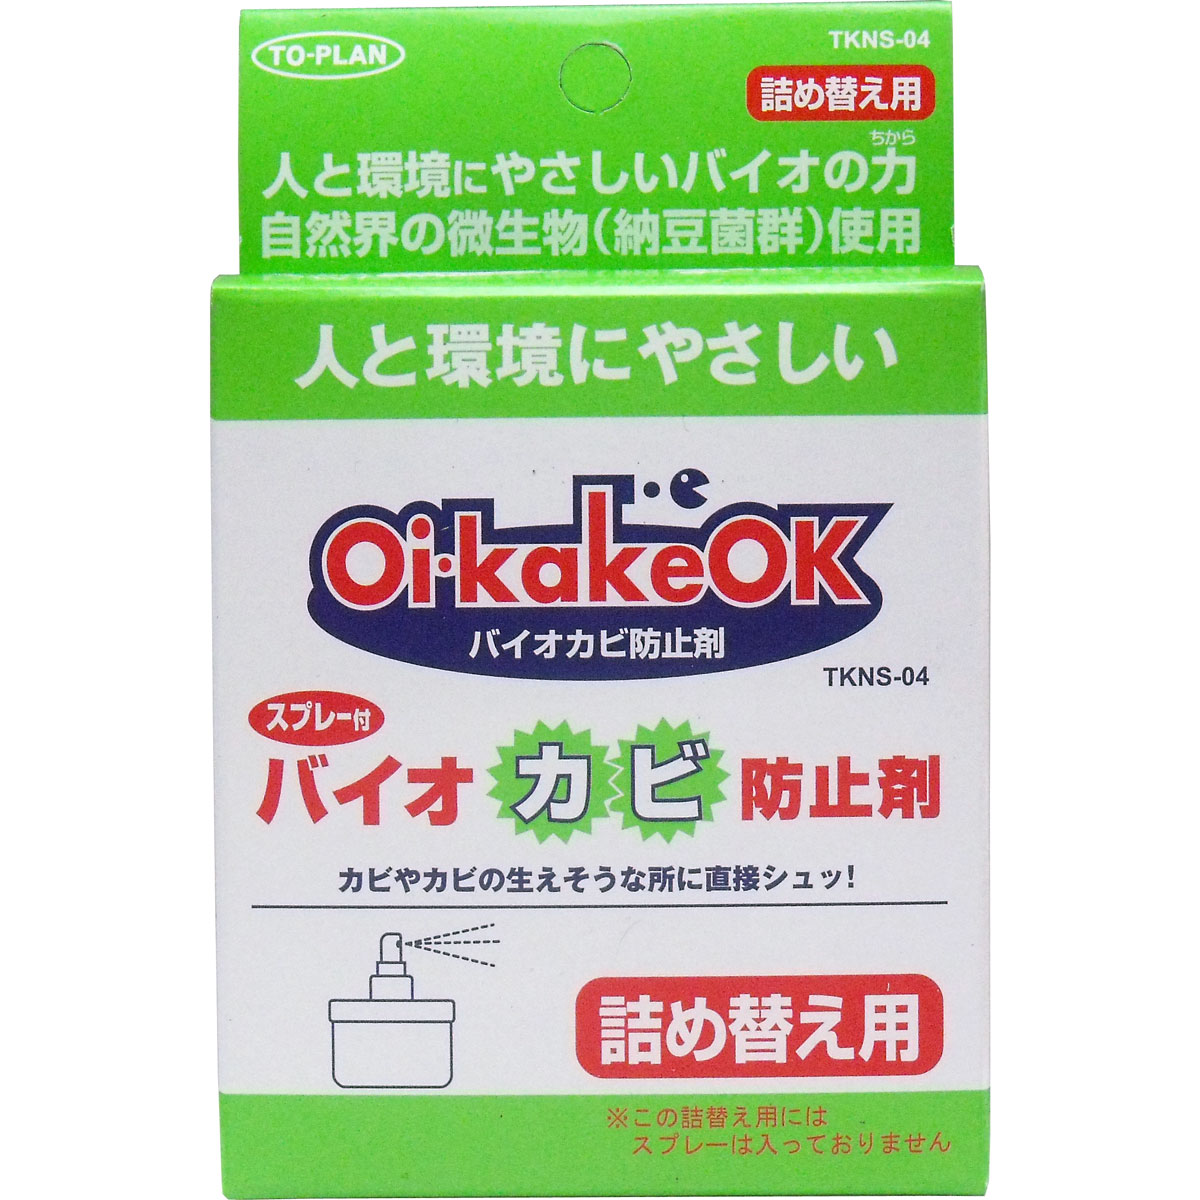 洗剤・柔軟剤・クリーナー, 除菌剤  OK 80cc